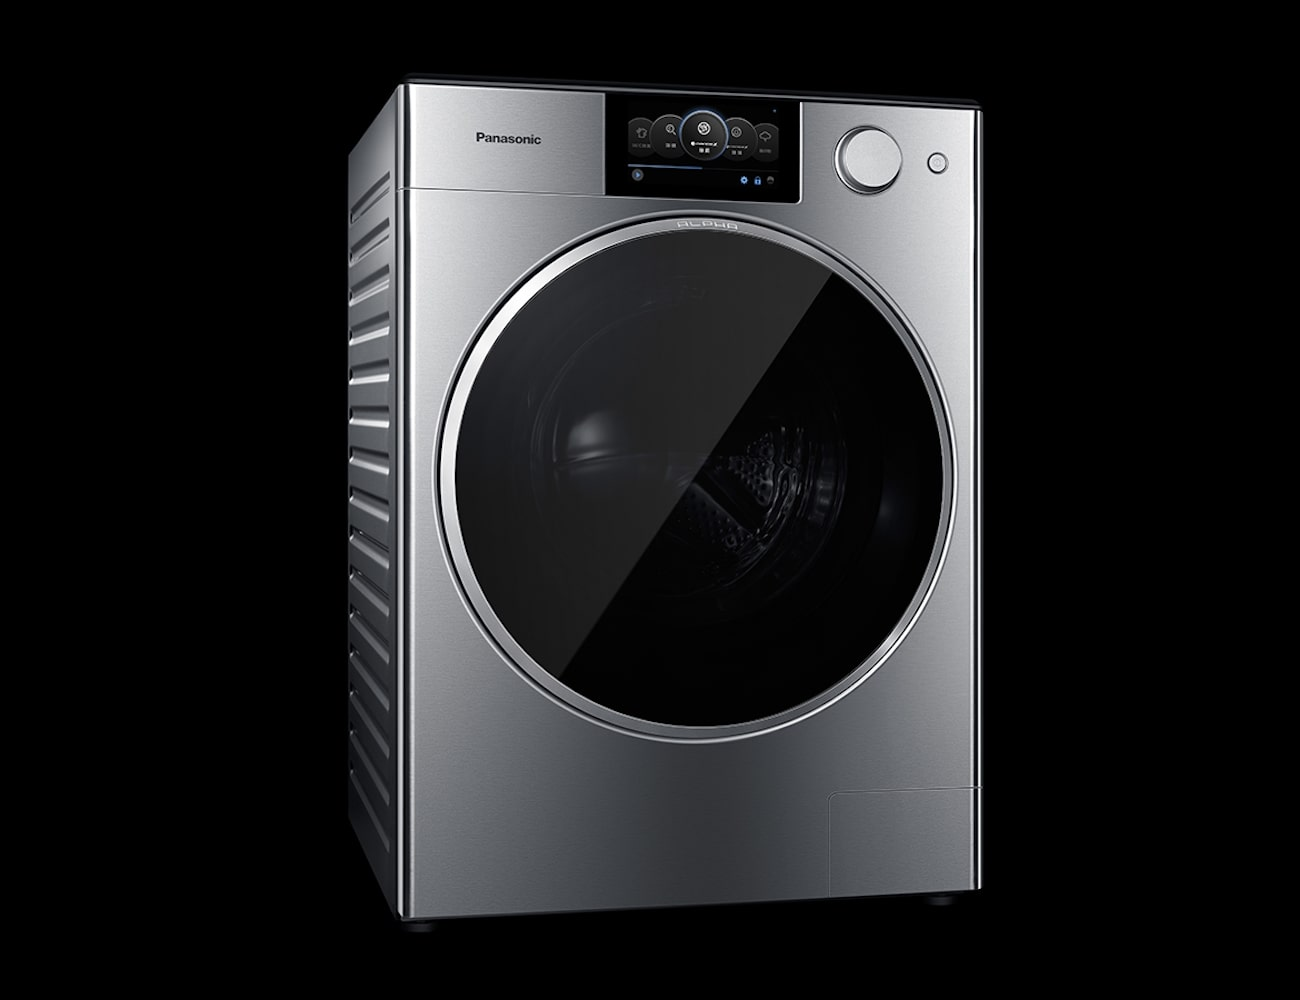 Panasonic Alpha Luxury Washing Machine » Gadget Flow on Washing Machine  id=33913